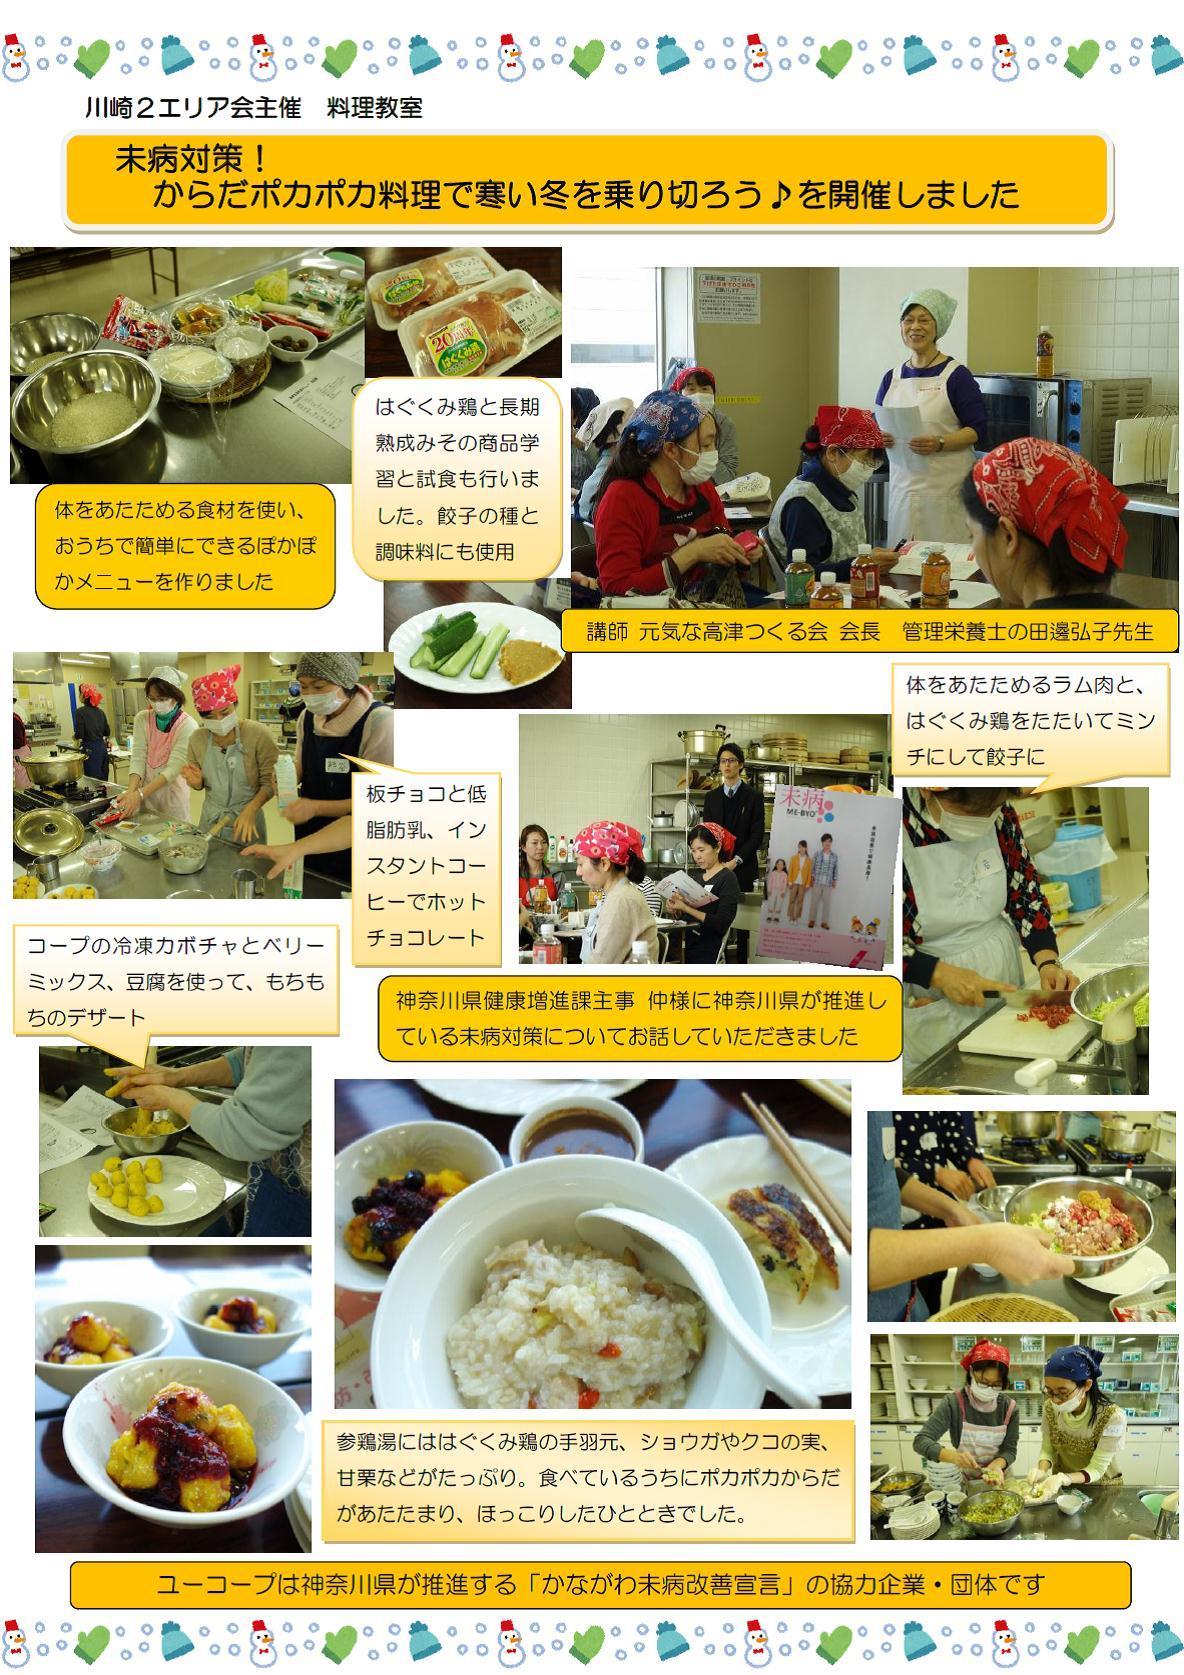 http://kanagawa.ucoop.or.jp/hiroba/areanews/files/2018-01-30%20kawasaki2-pokapoka.jpg